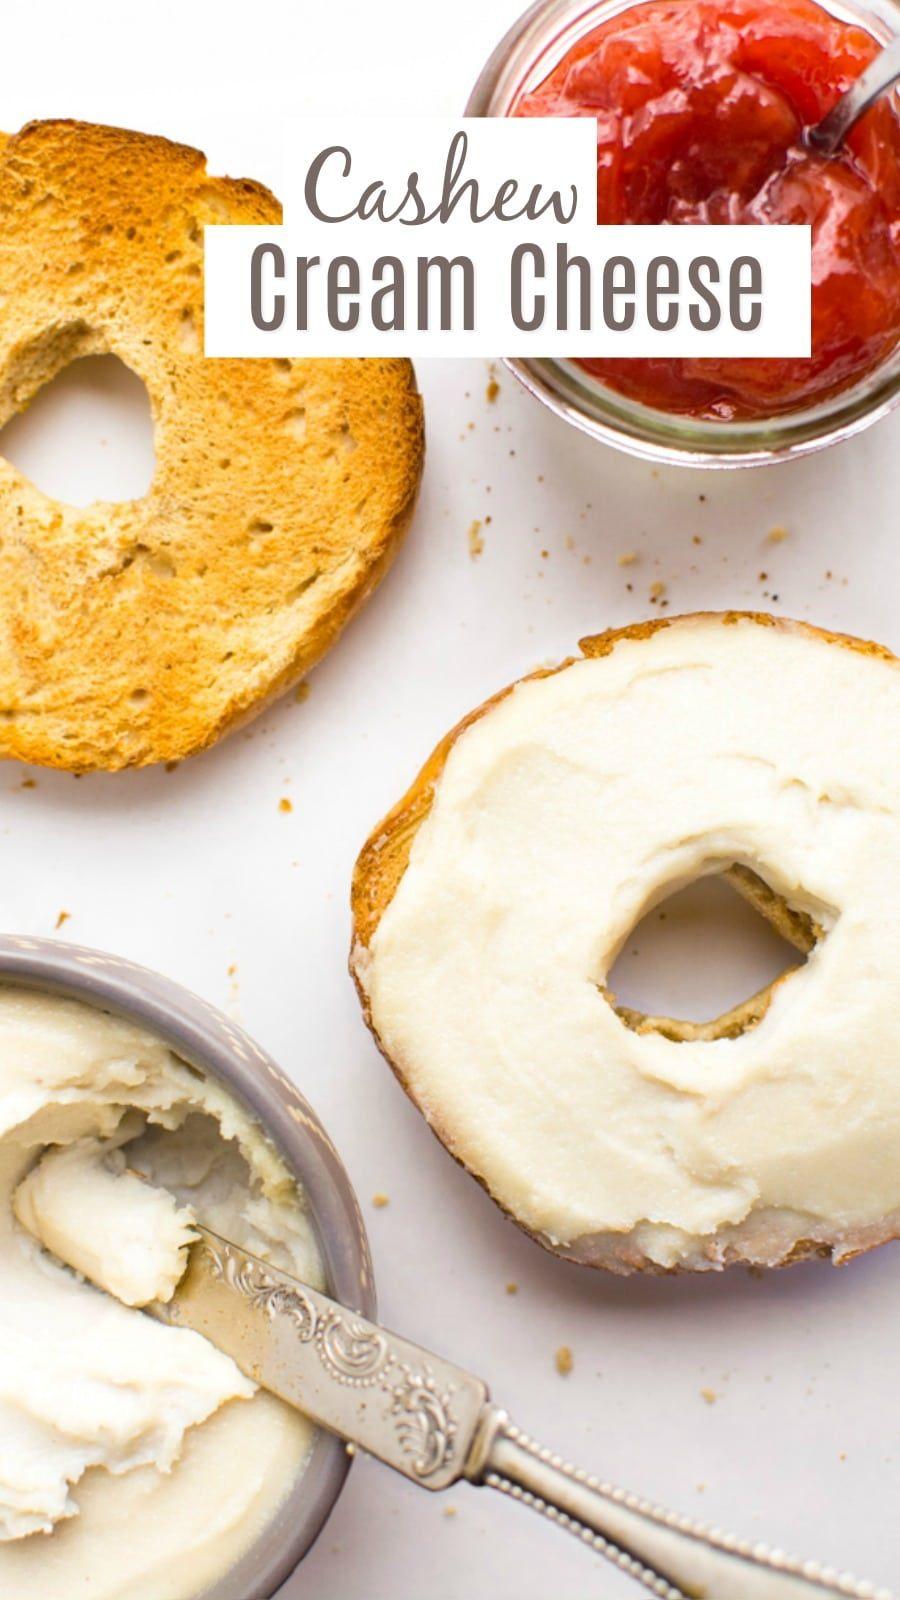 Cashew Cream Cheese Food Processor Recipes Dairy Free Cream Cheese Dairy Free Cheese